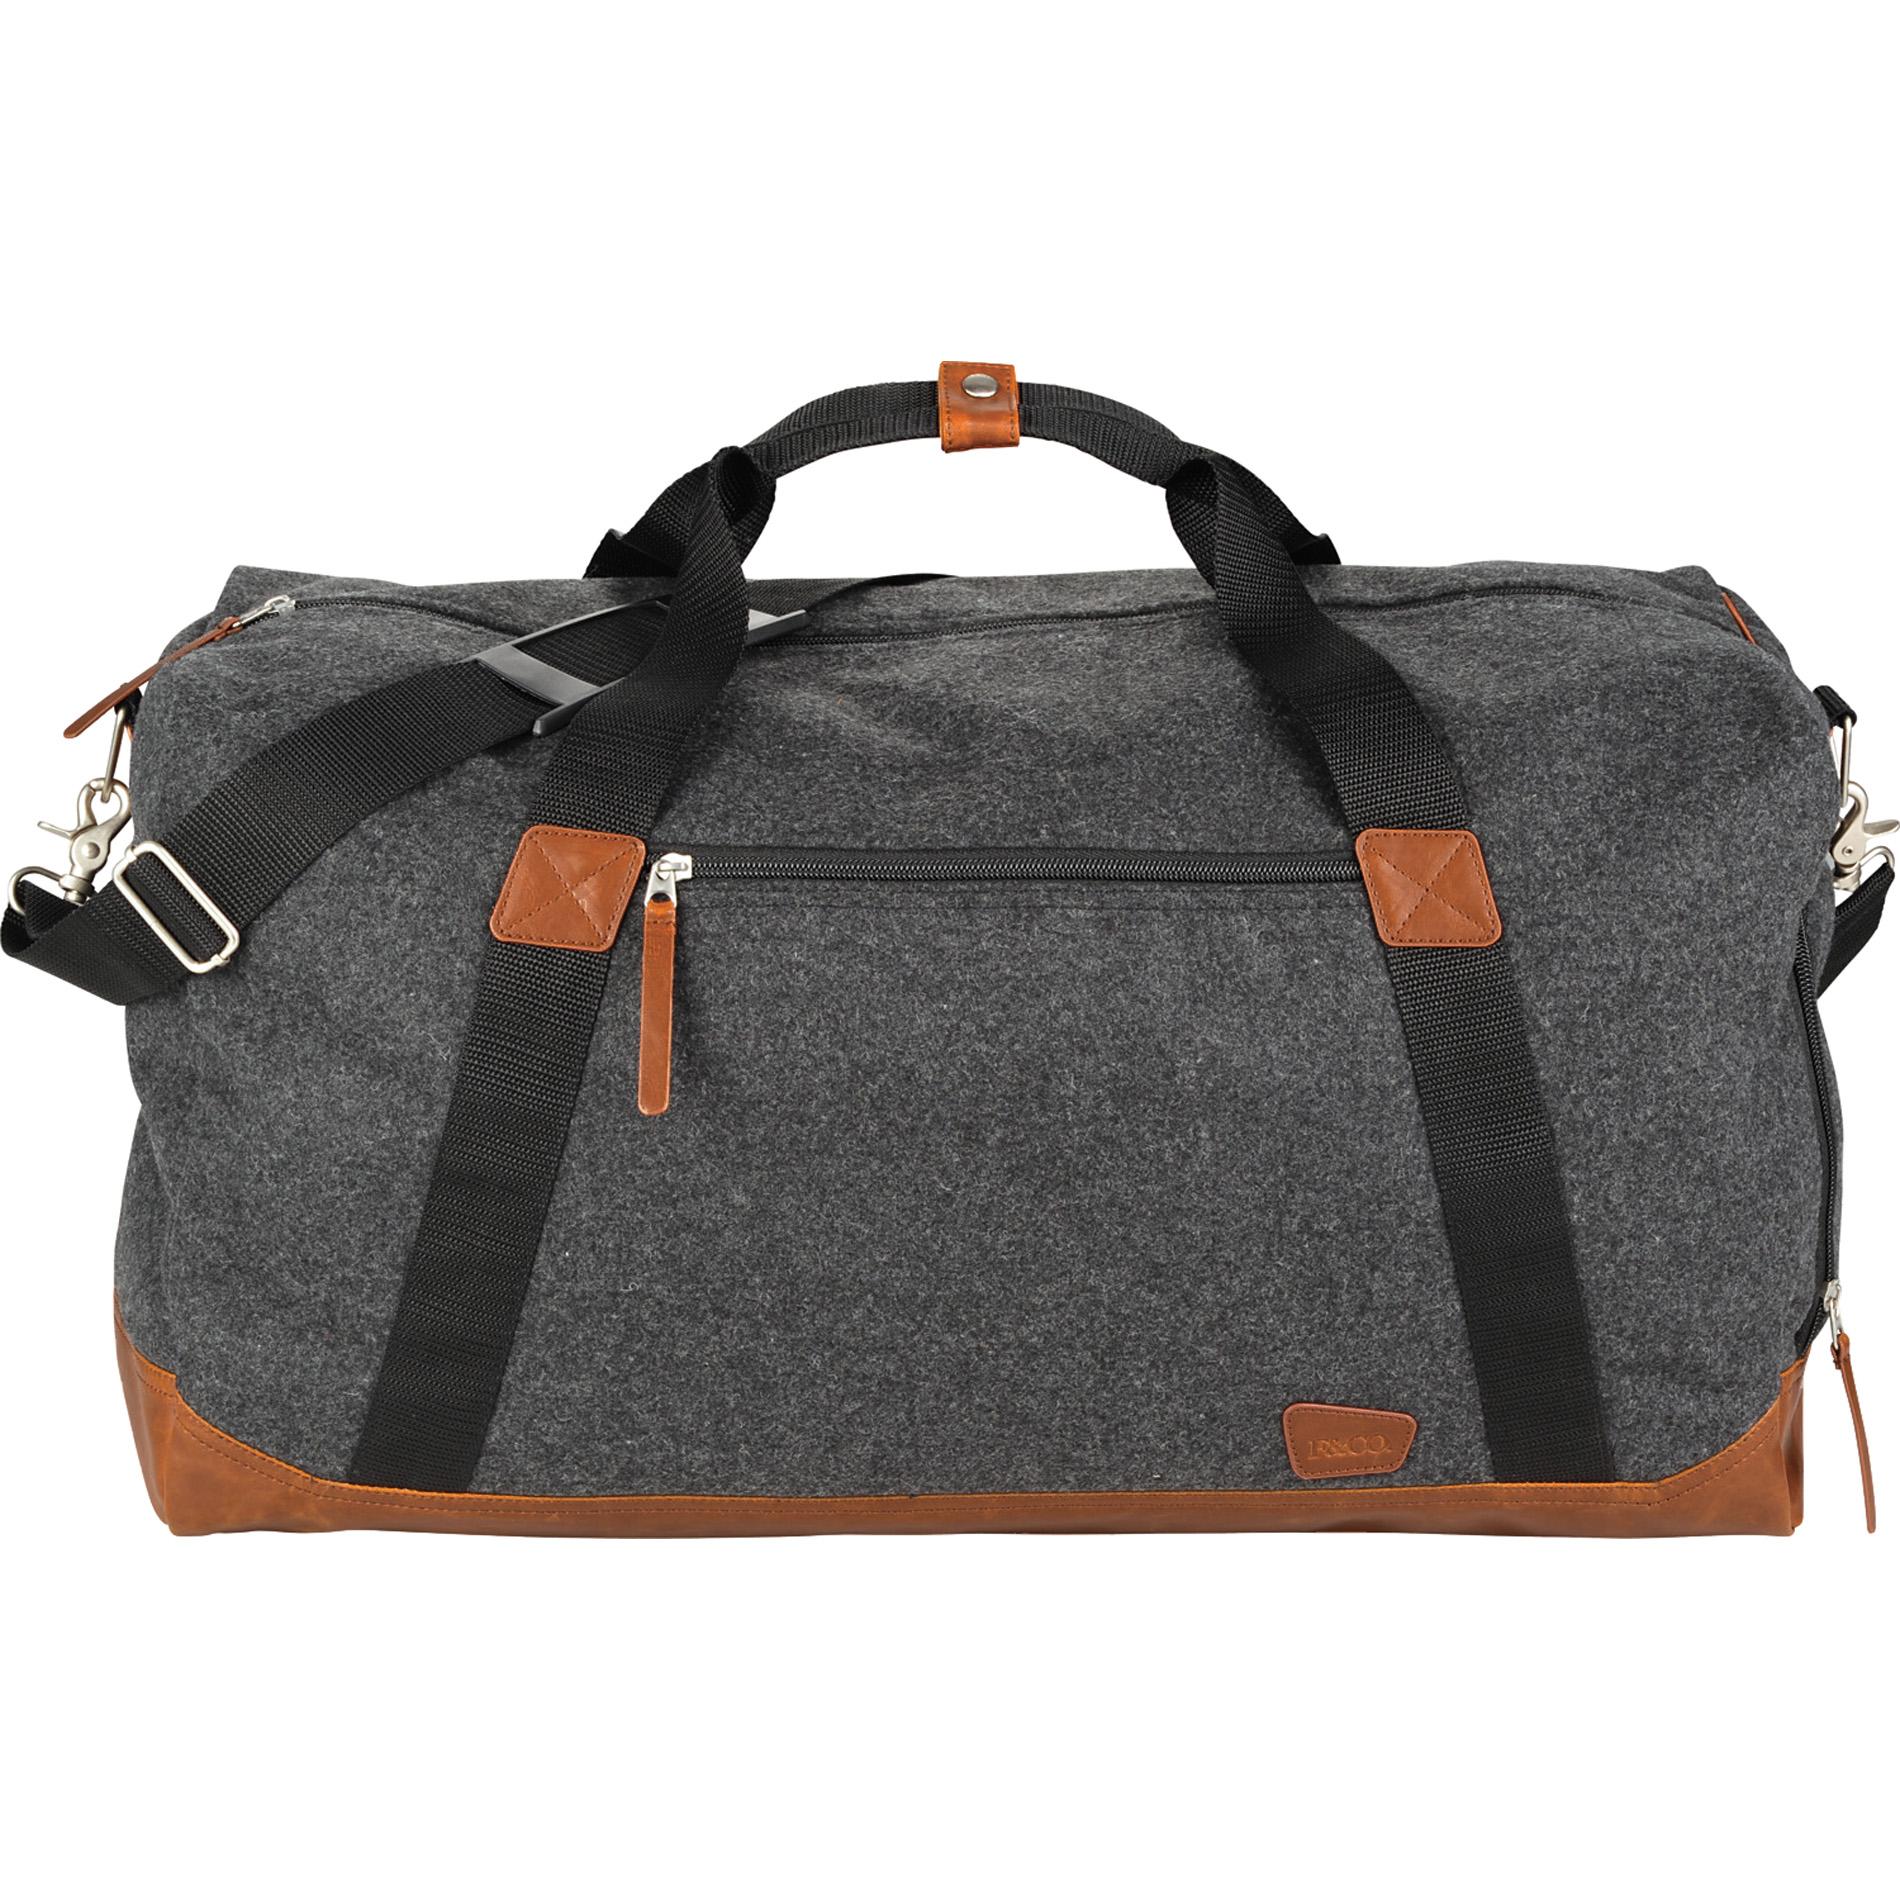 "Field & Co.? Campster 22"" Duffel Bag"